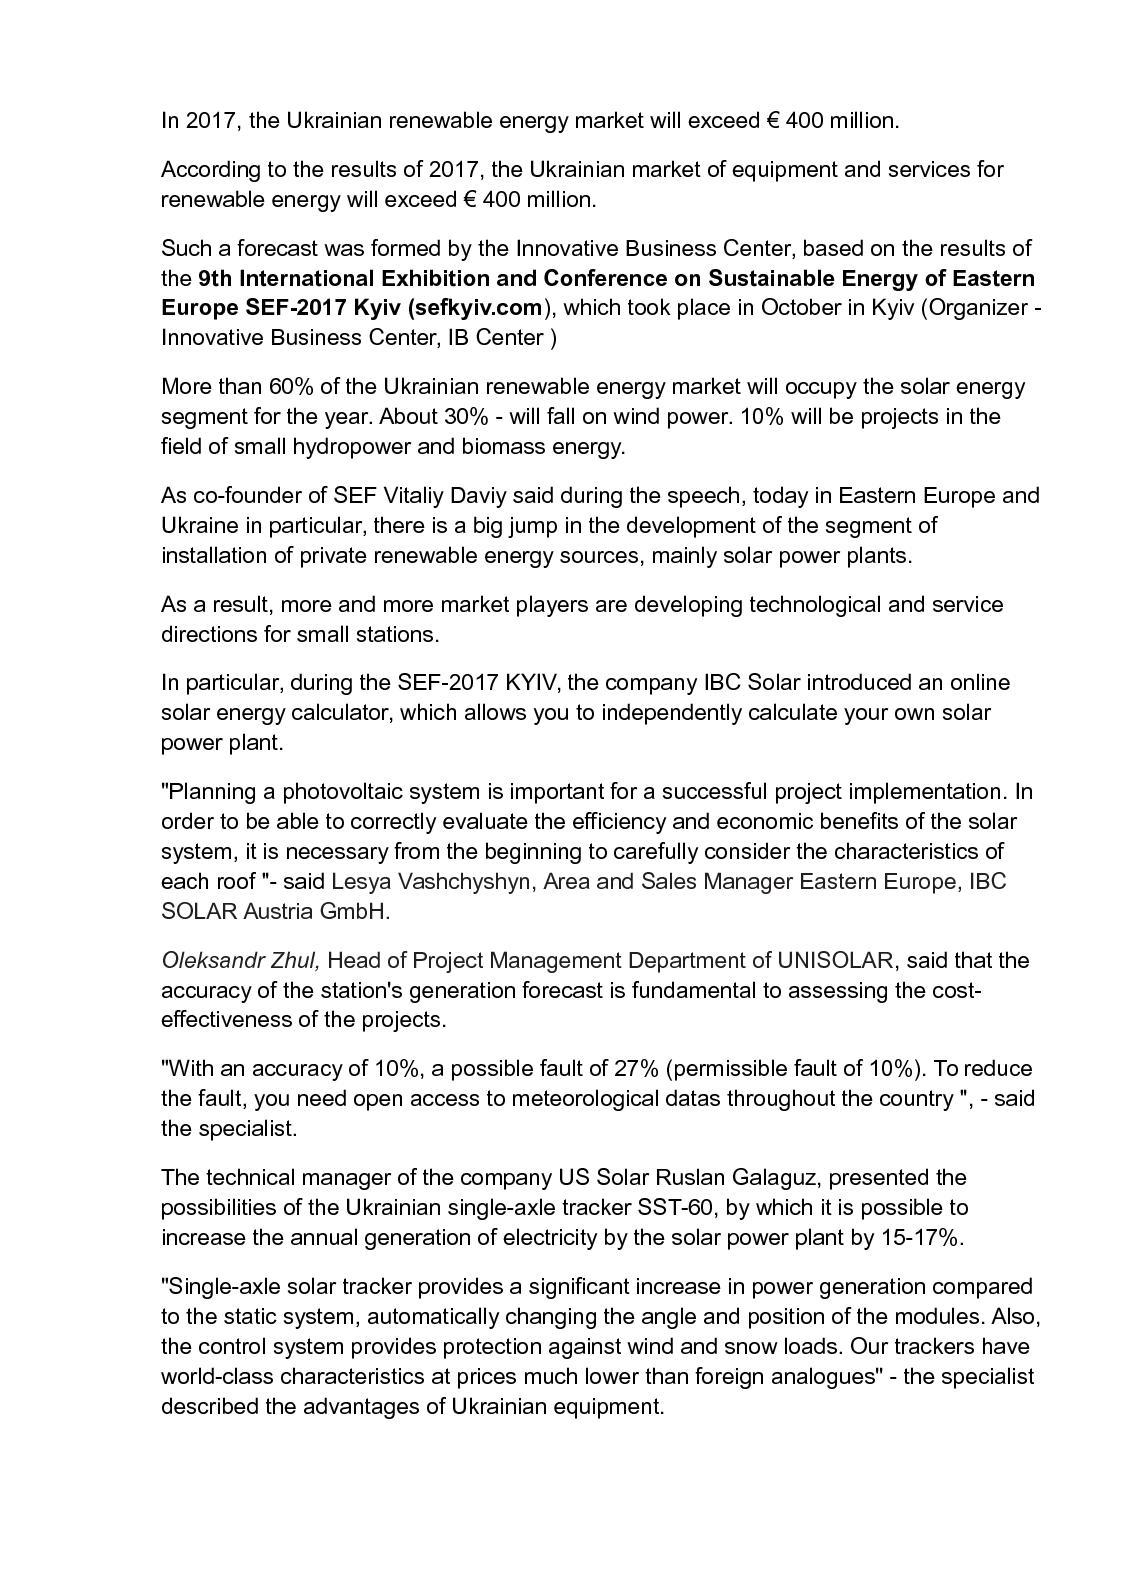 Calaméo - In 2017, the Ukrainian renewable energy market